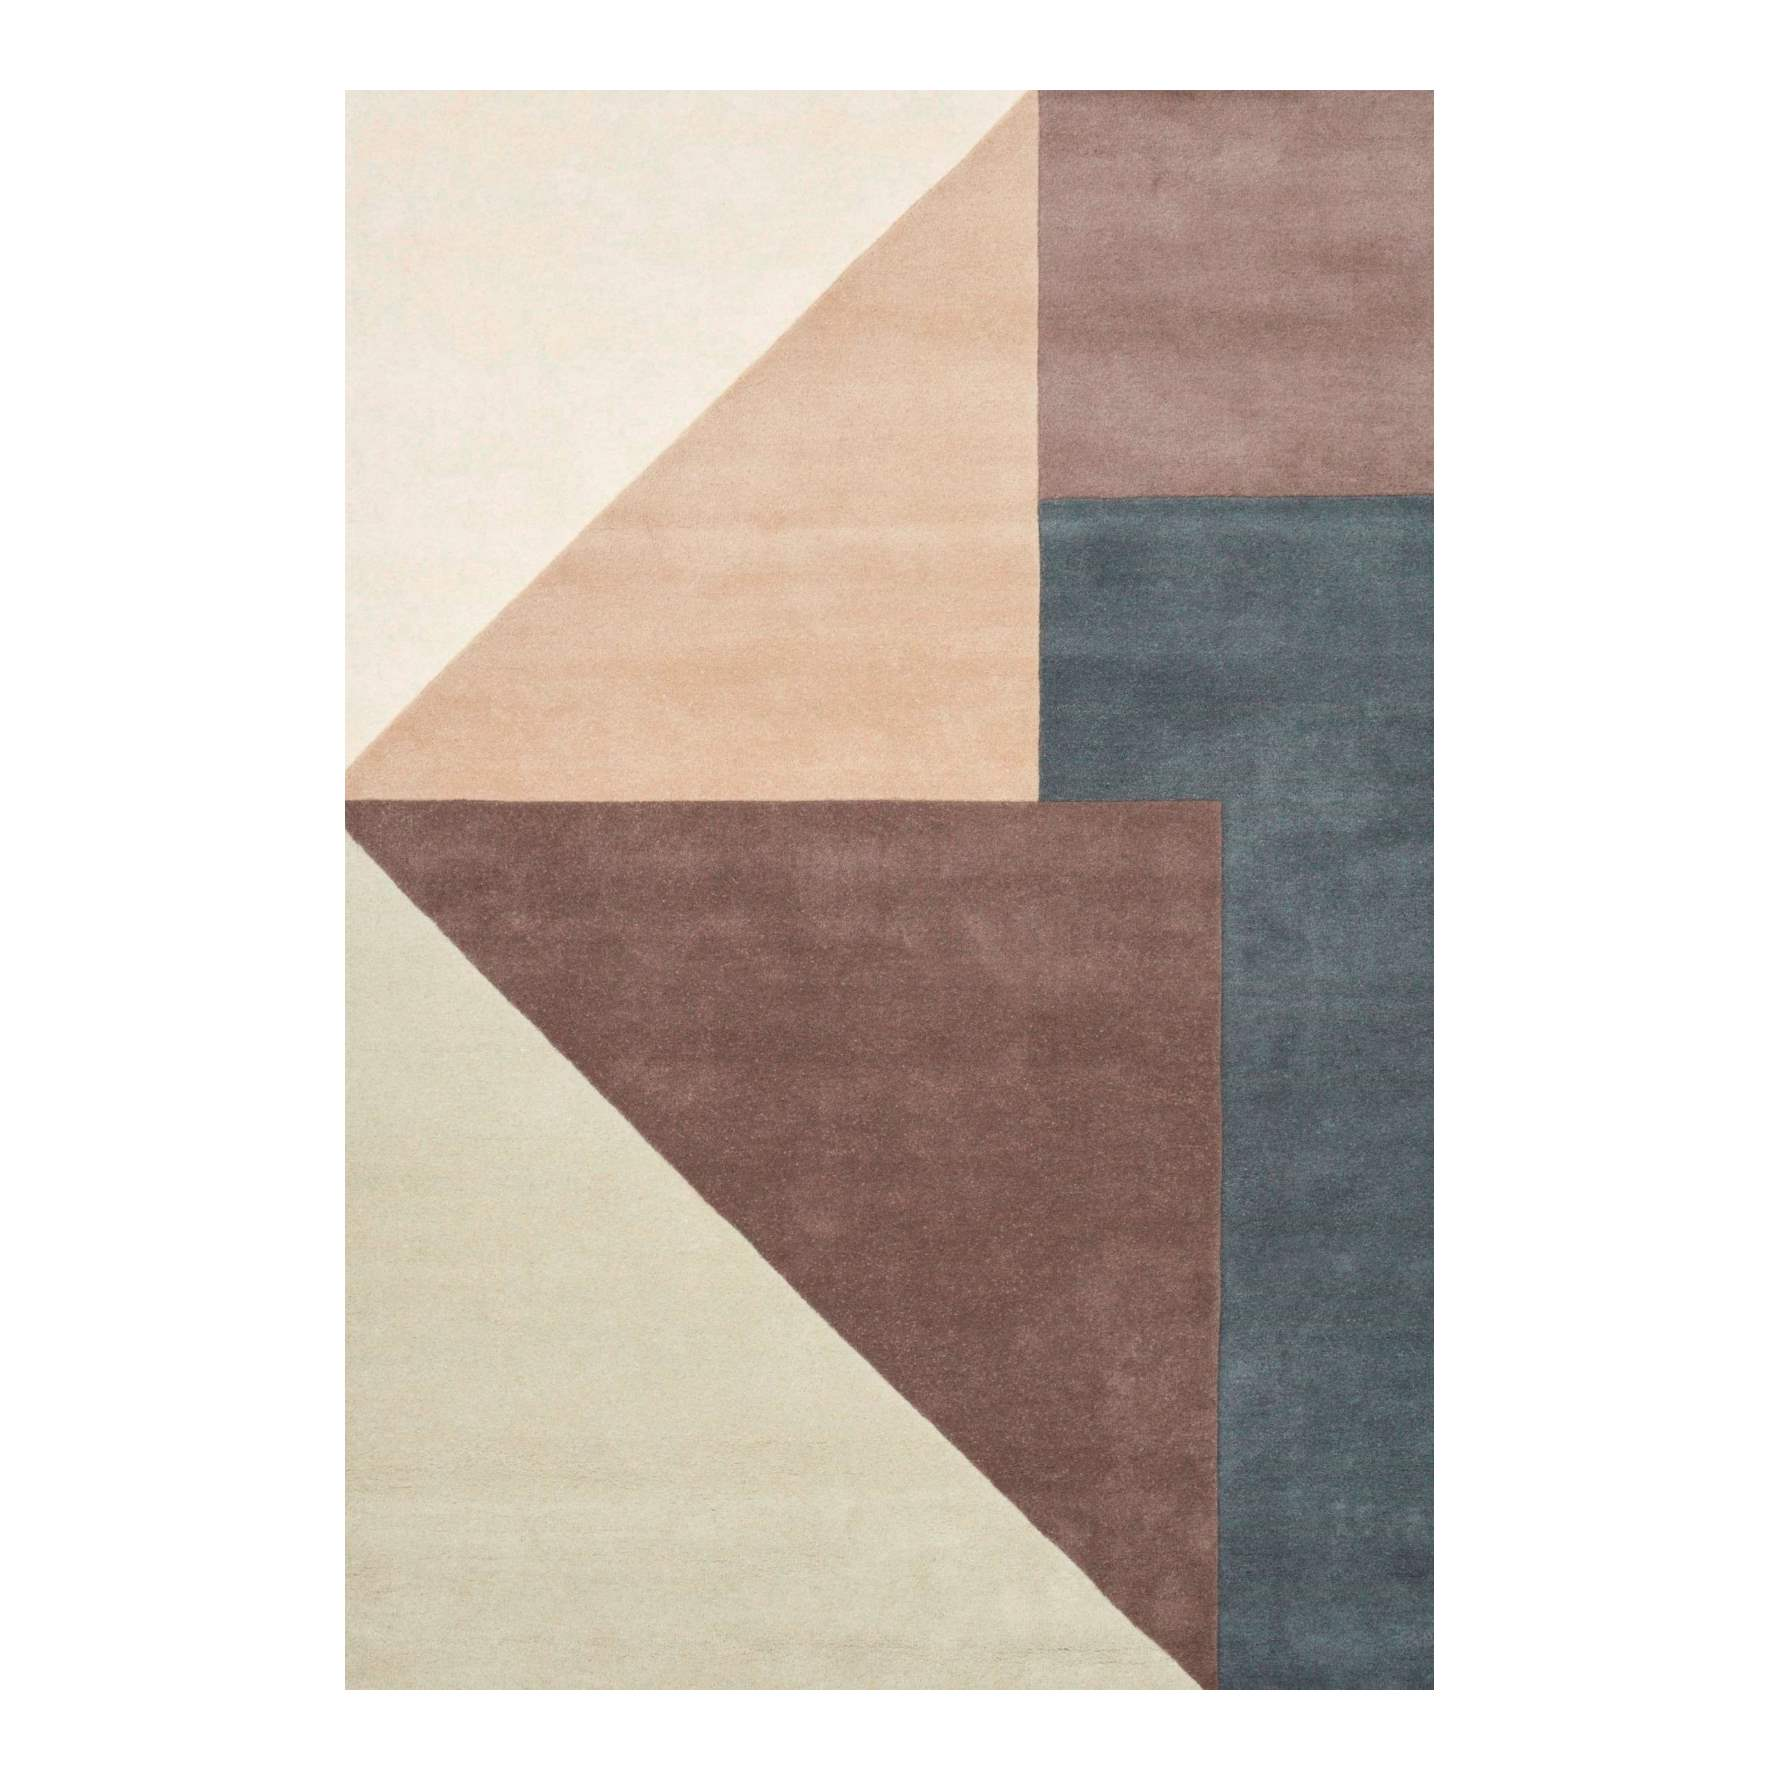 Ullmatta ARGUTO 200 x 300 cm Mixed, Linie Design